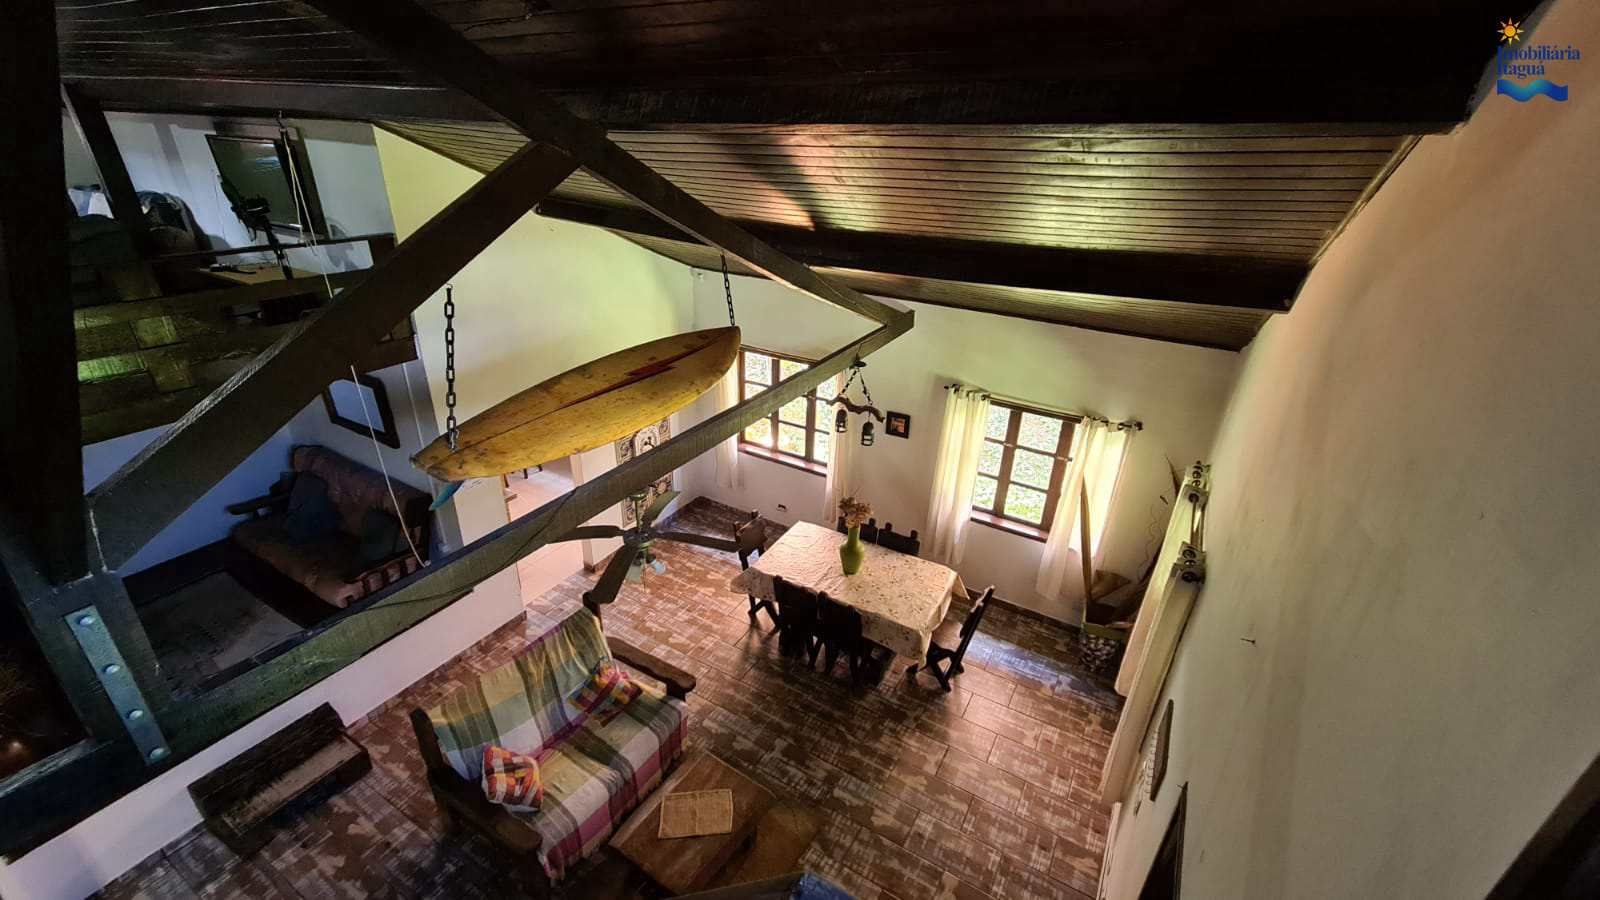 Casa com 4 dorms, Praia Grande, Ubatuba - R$ 1.45 mi, Cod: CA1201